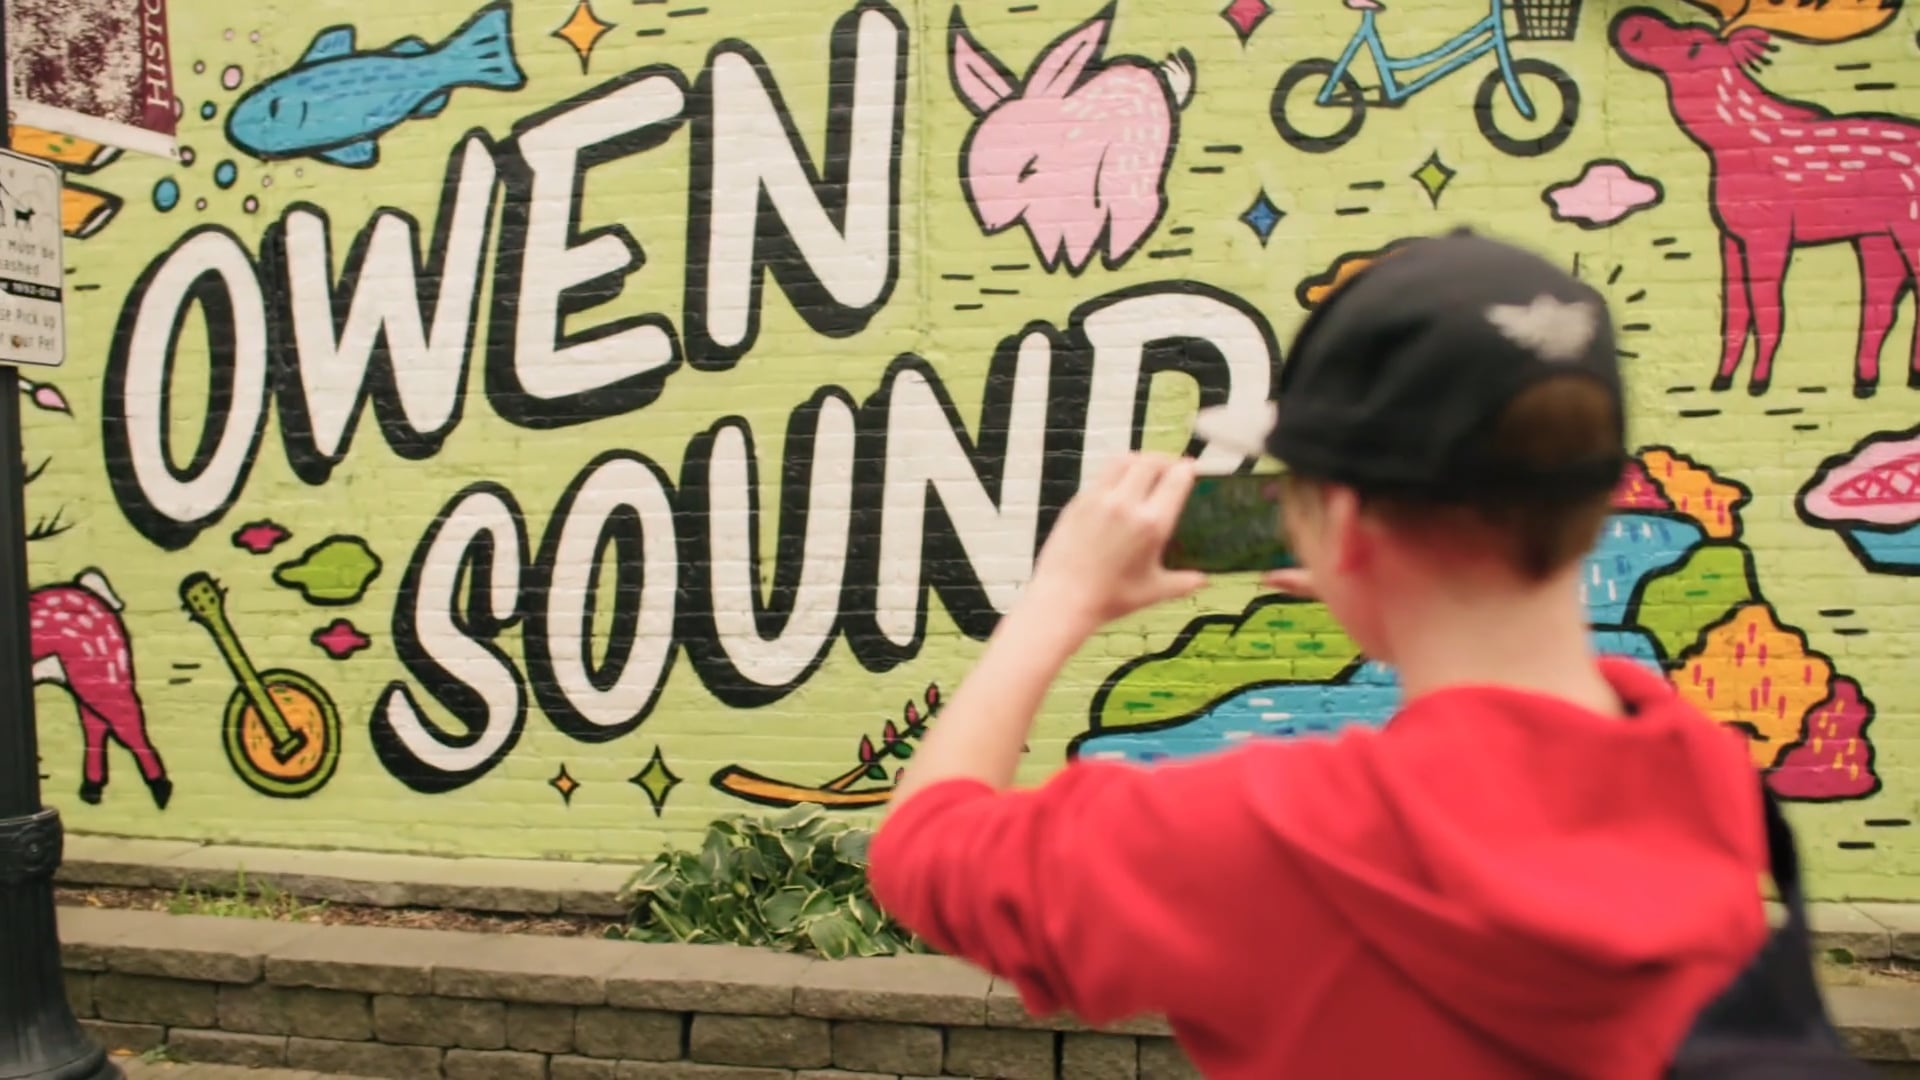 Koodo Love Letter To Owen Sound Mural